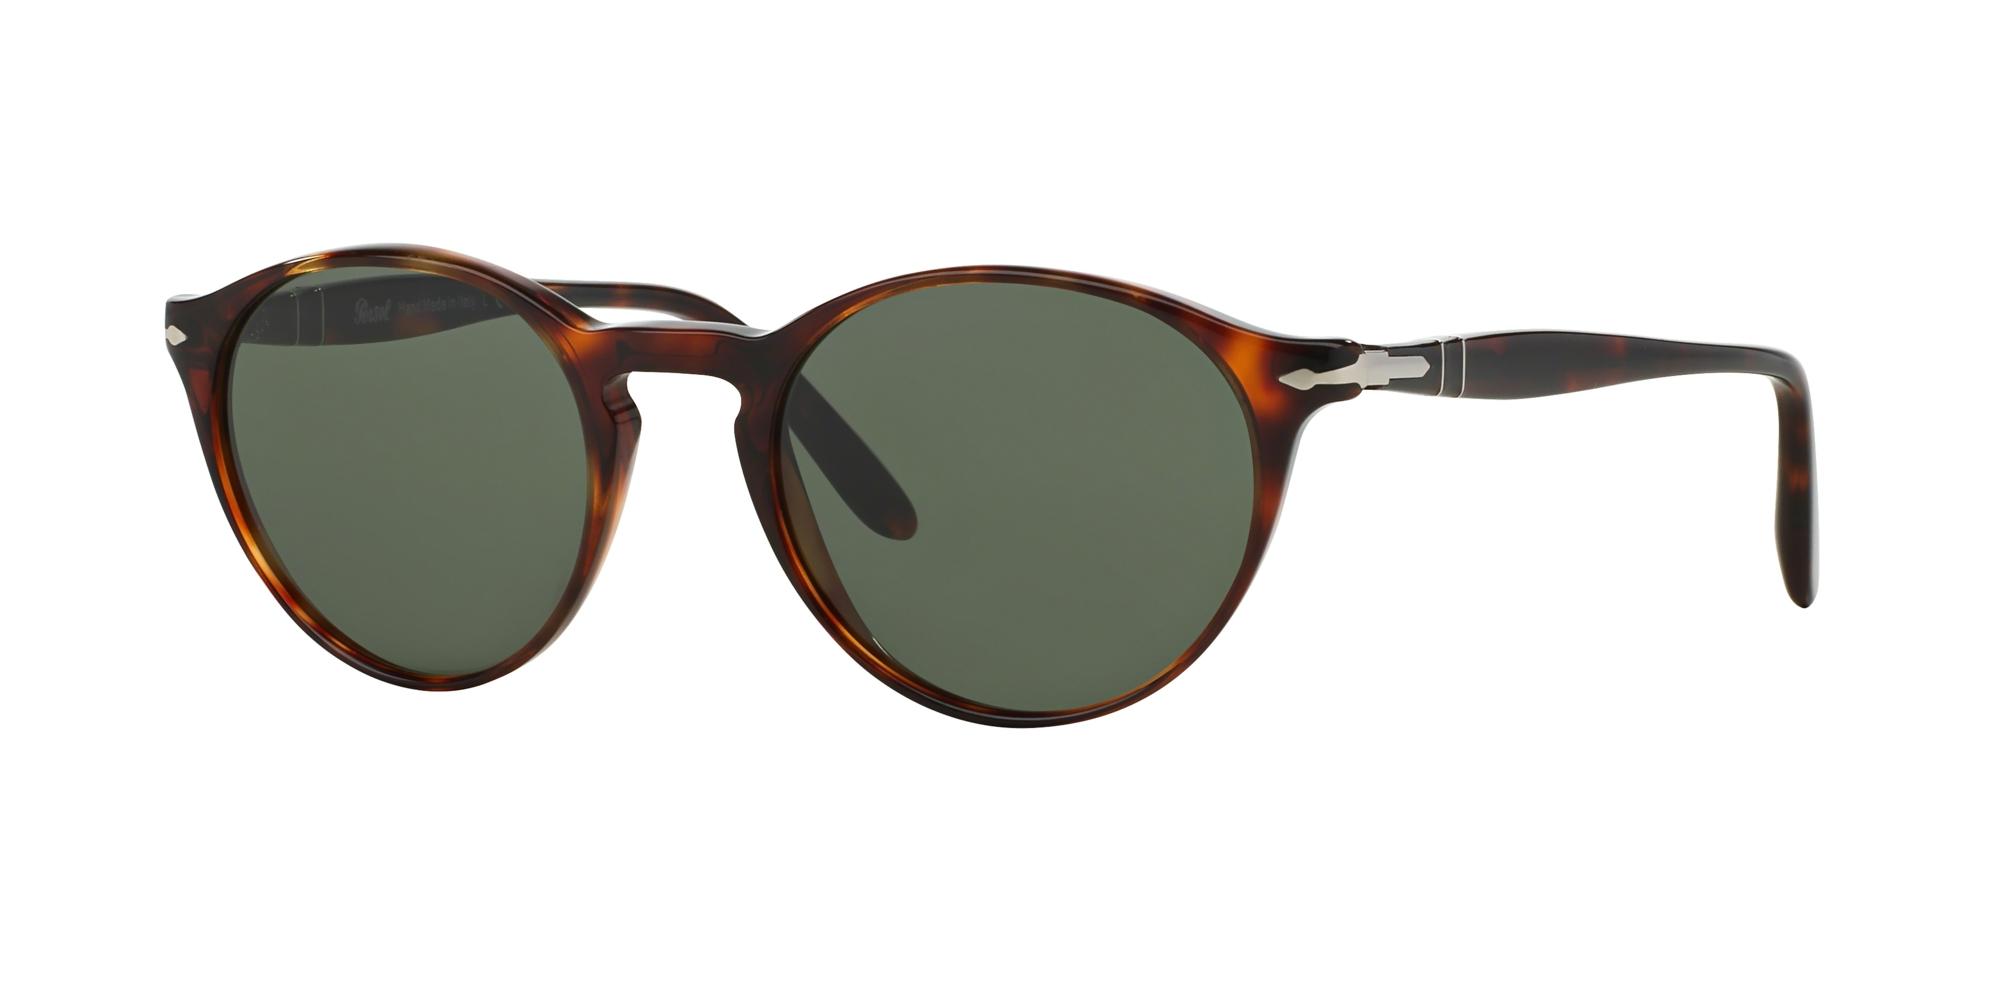 Persol Sonnenbrille 0PO3092SM50901531 bei ROTTLER